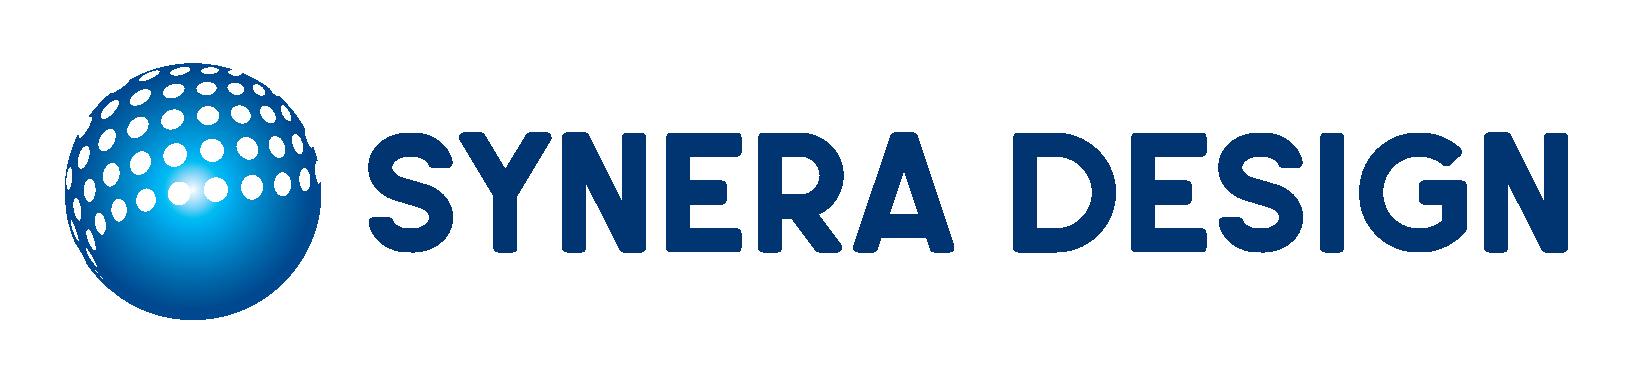 Synera Design